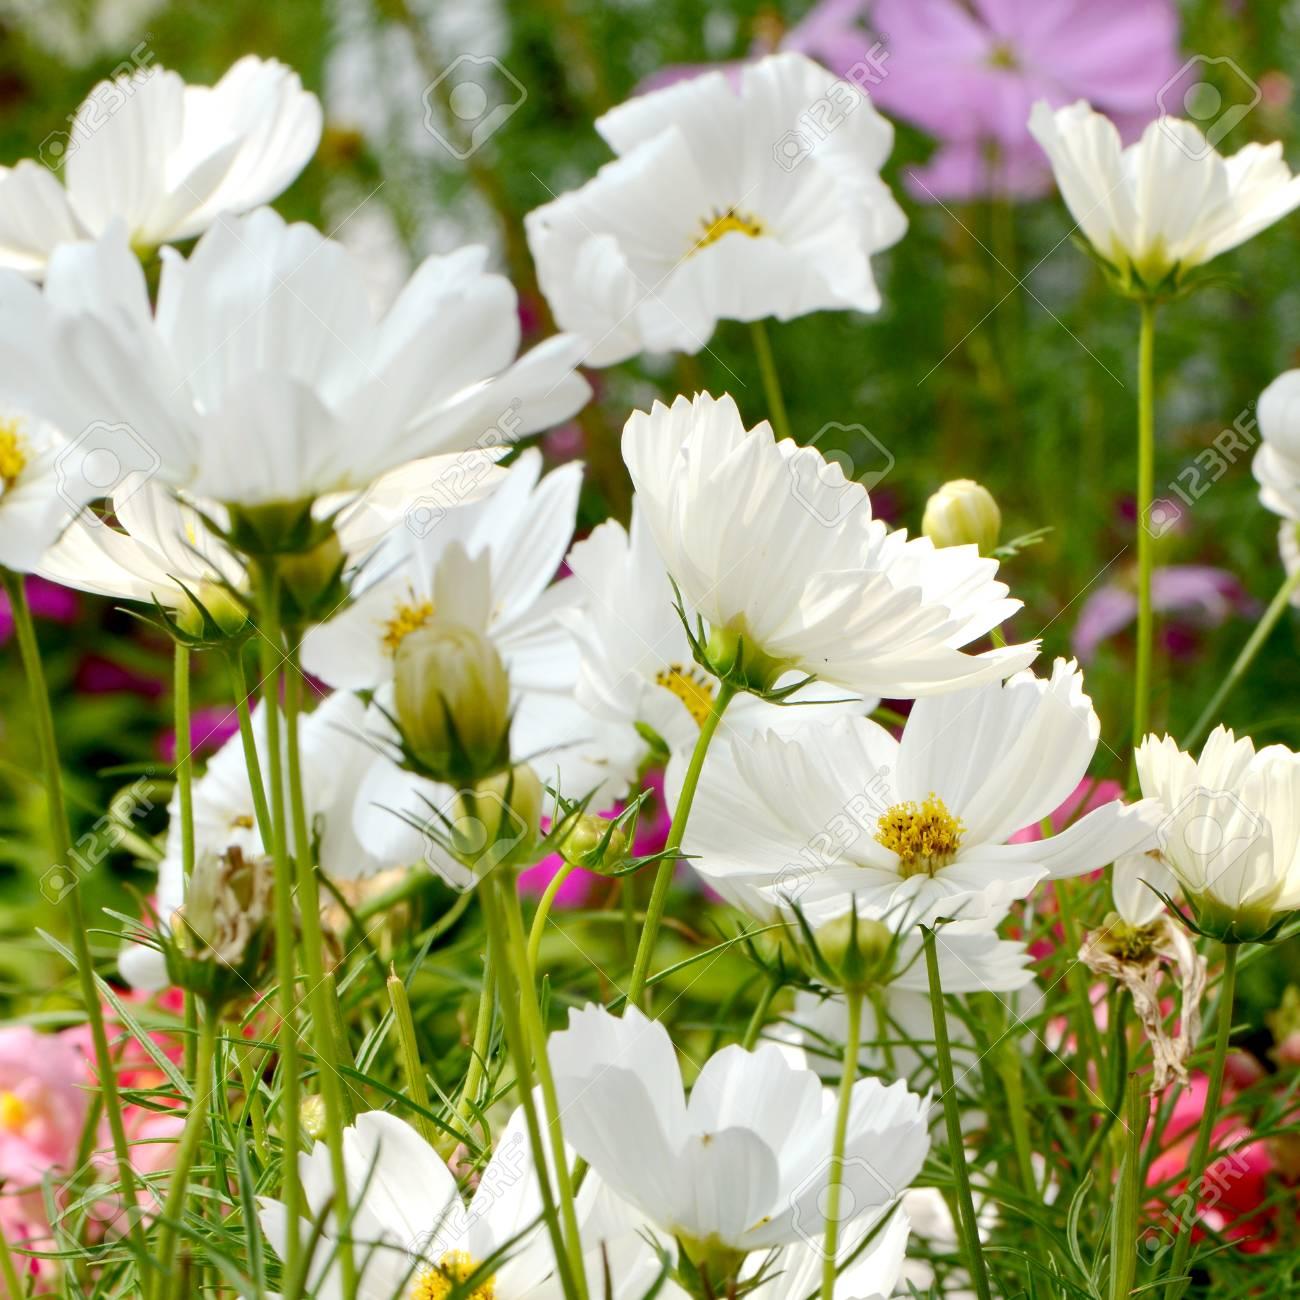 White Cosmos Flowers Field Cosmos Sulphureus Stock Photo Picture